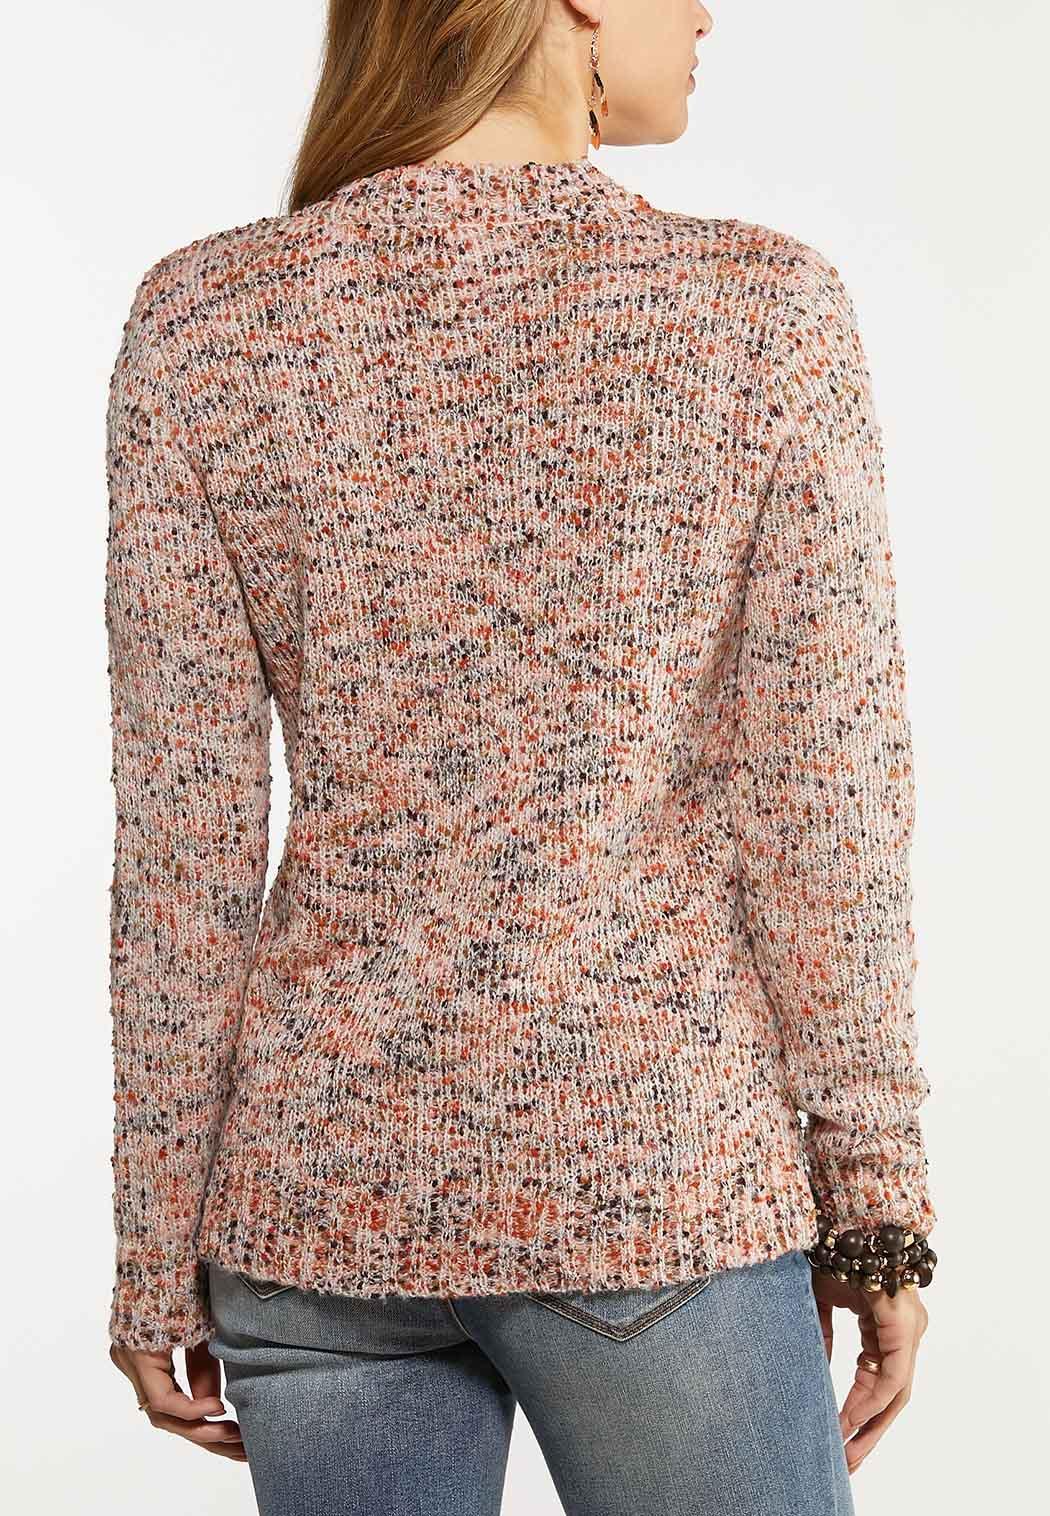 Multi Popcorn Textured Sweater (Item #44026568)